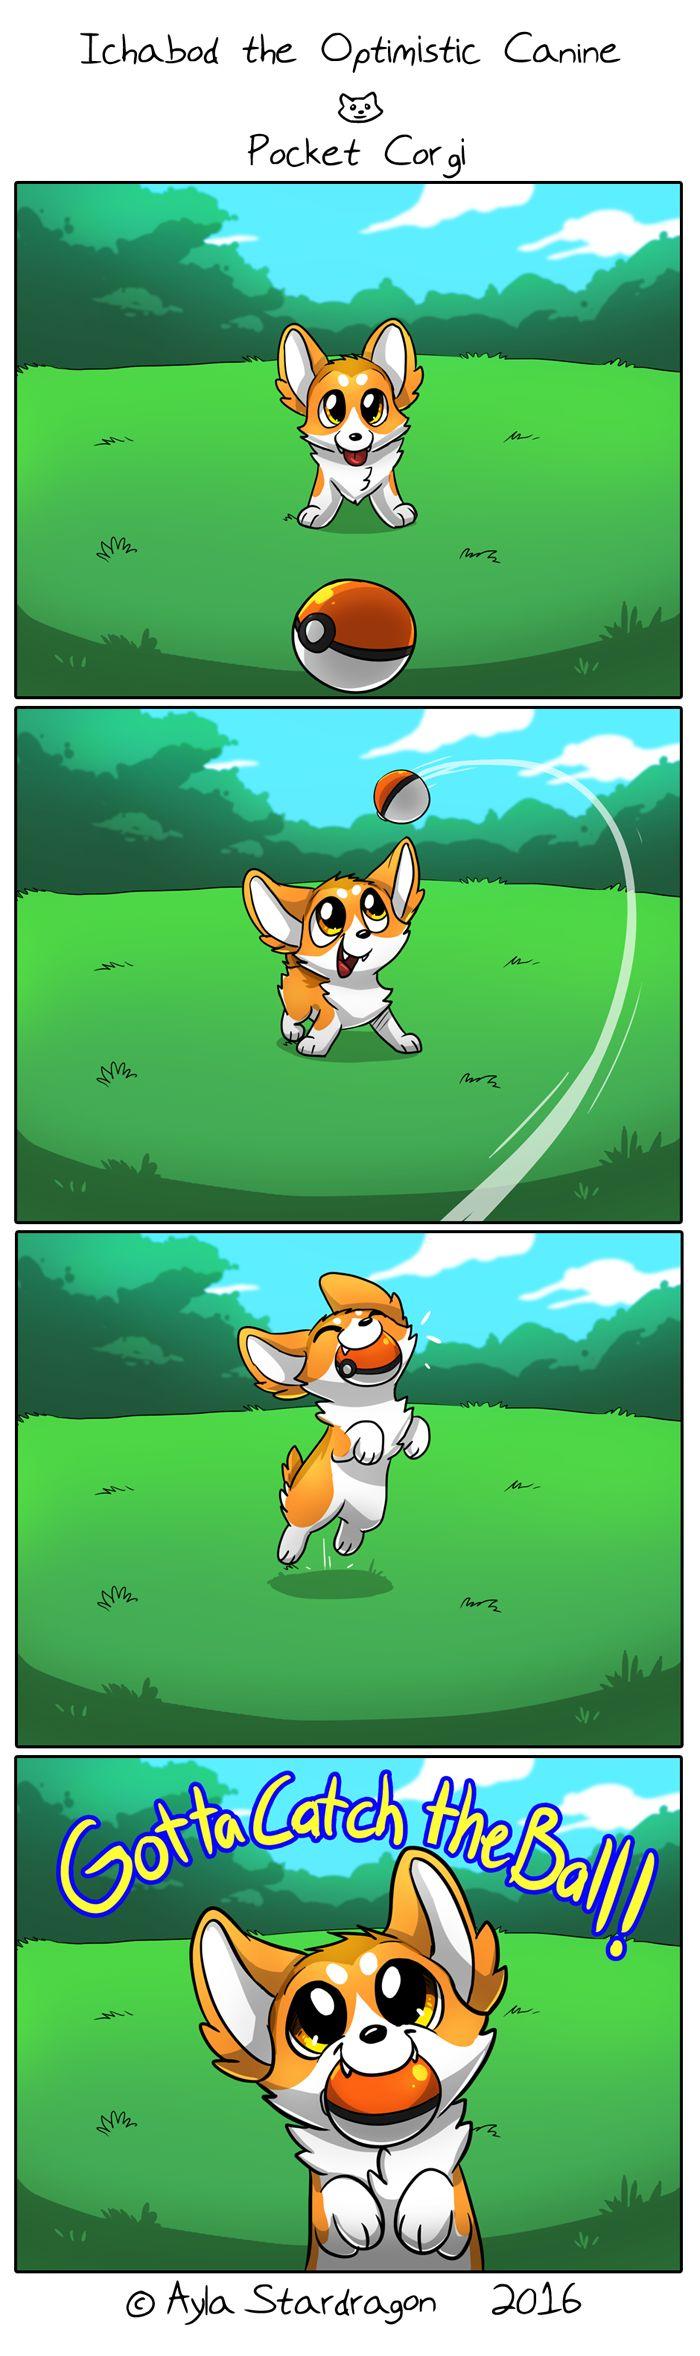 Ichabod the Optimistic Canine :: Pocket Corgi | Tapastic Comics - image 1